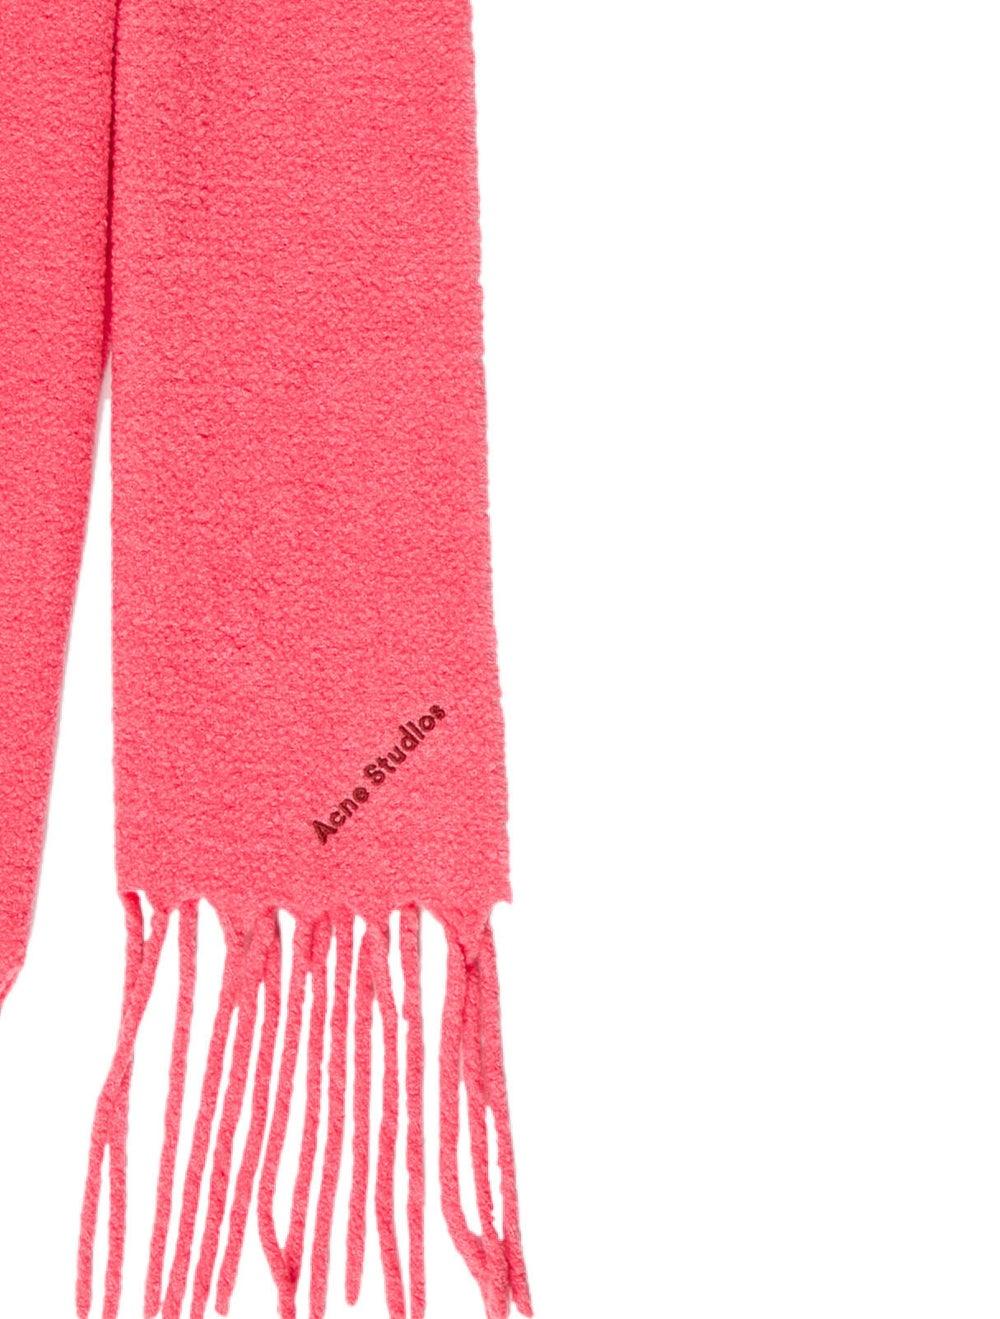 Acne Studios Villy Wool Scarf Pink - image 2